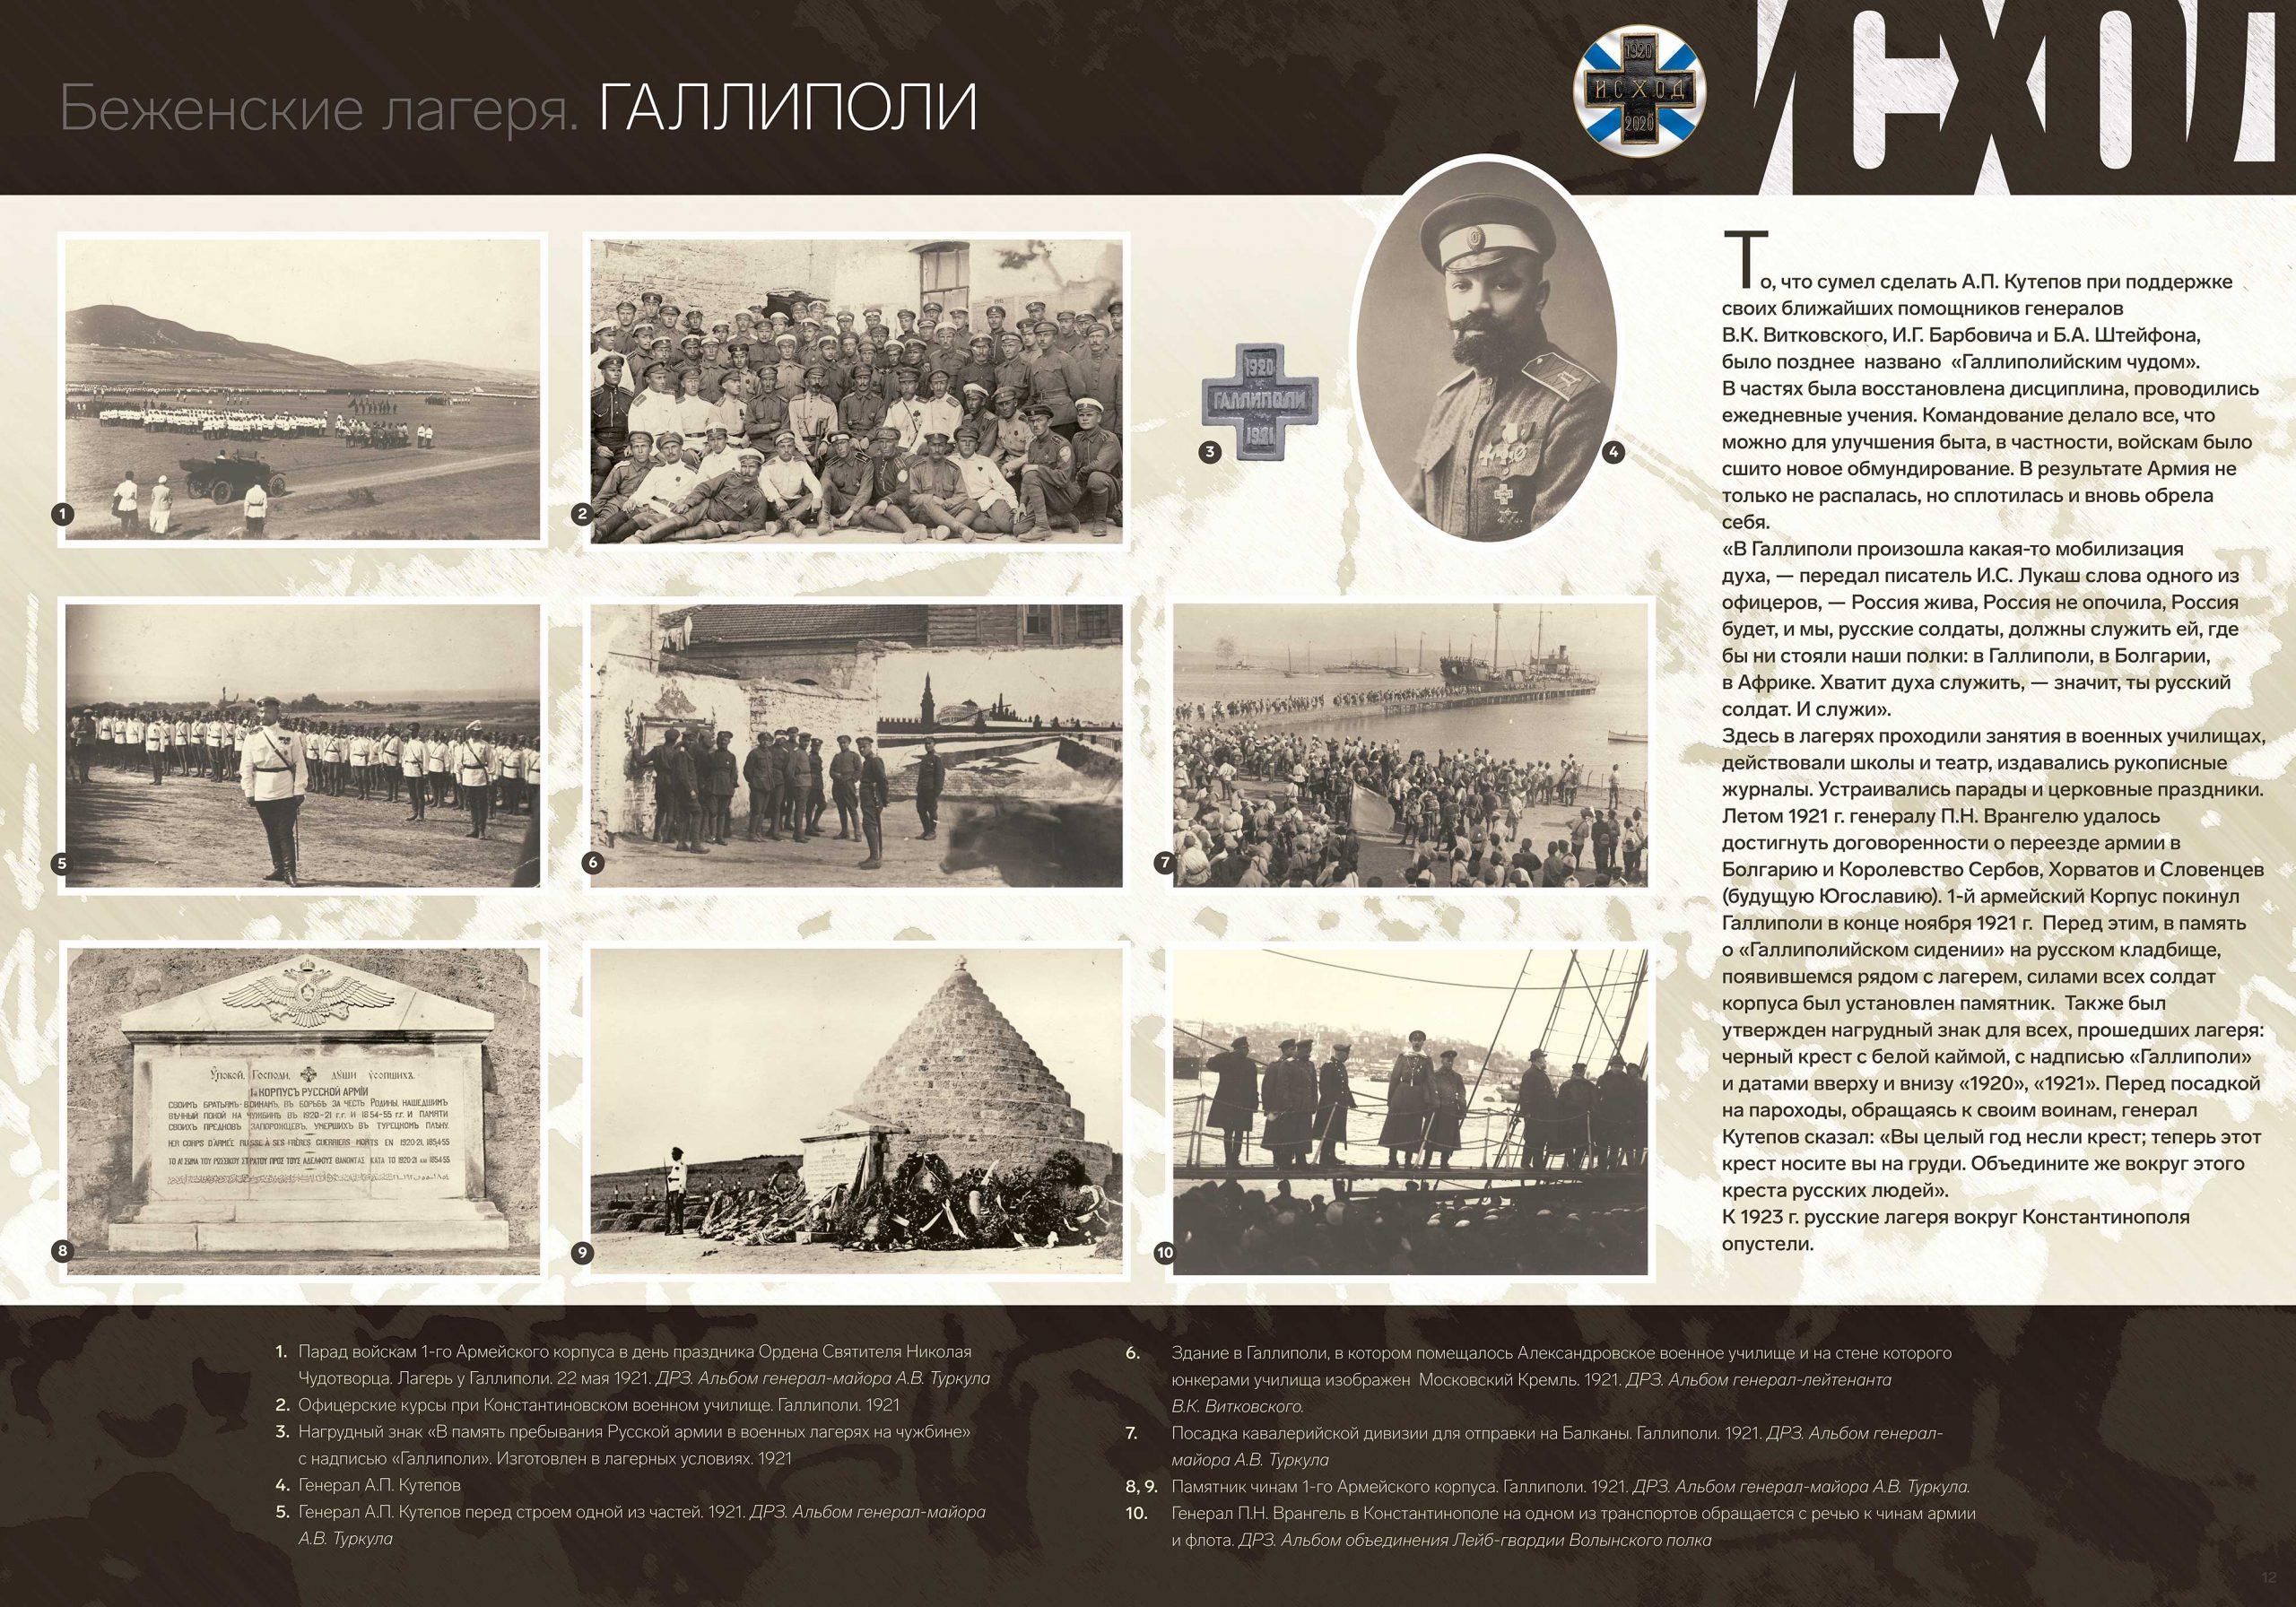 04_exode-1920-1922_2-1